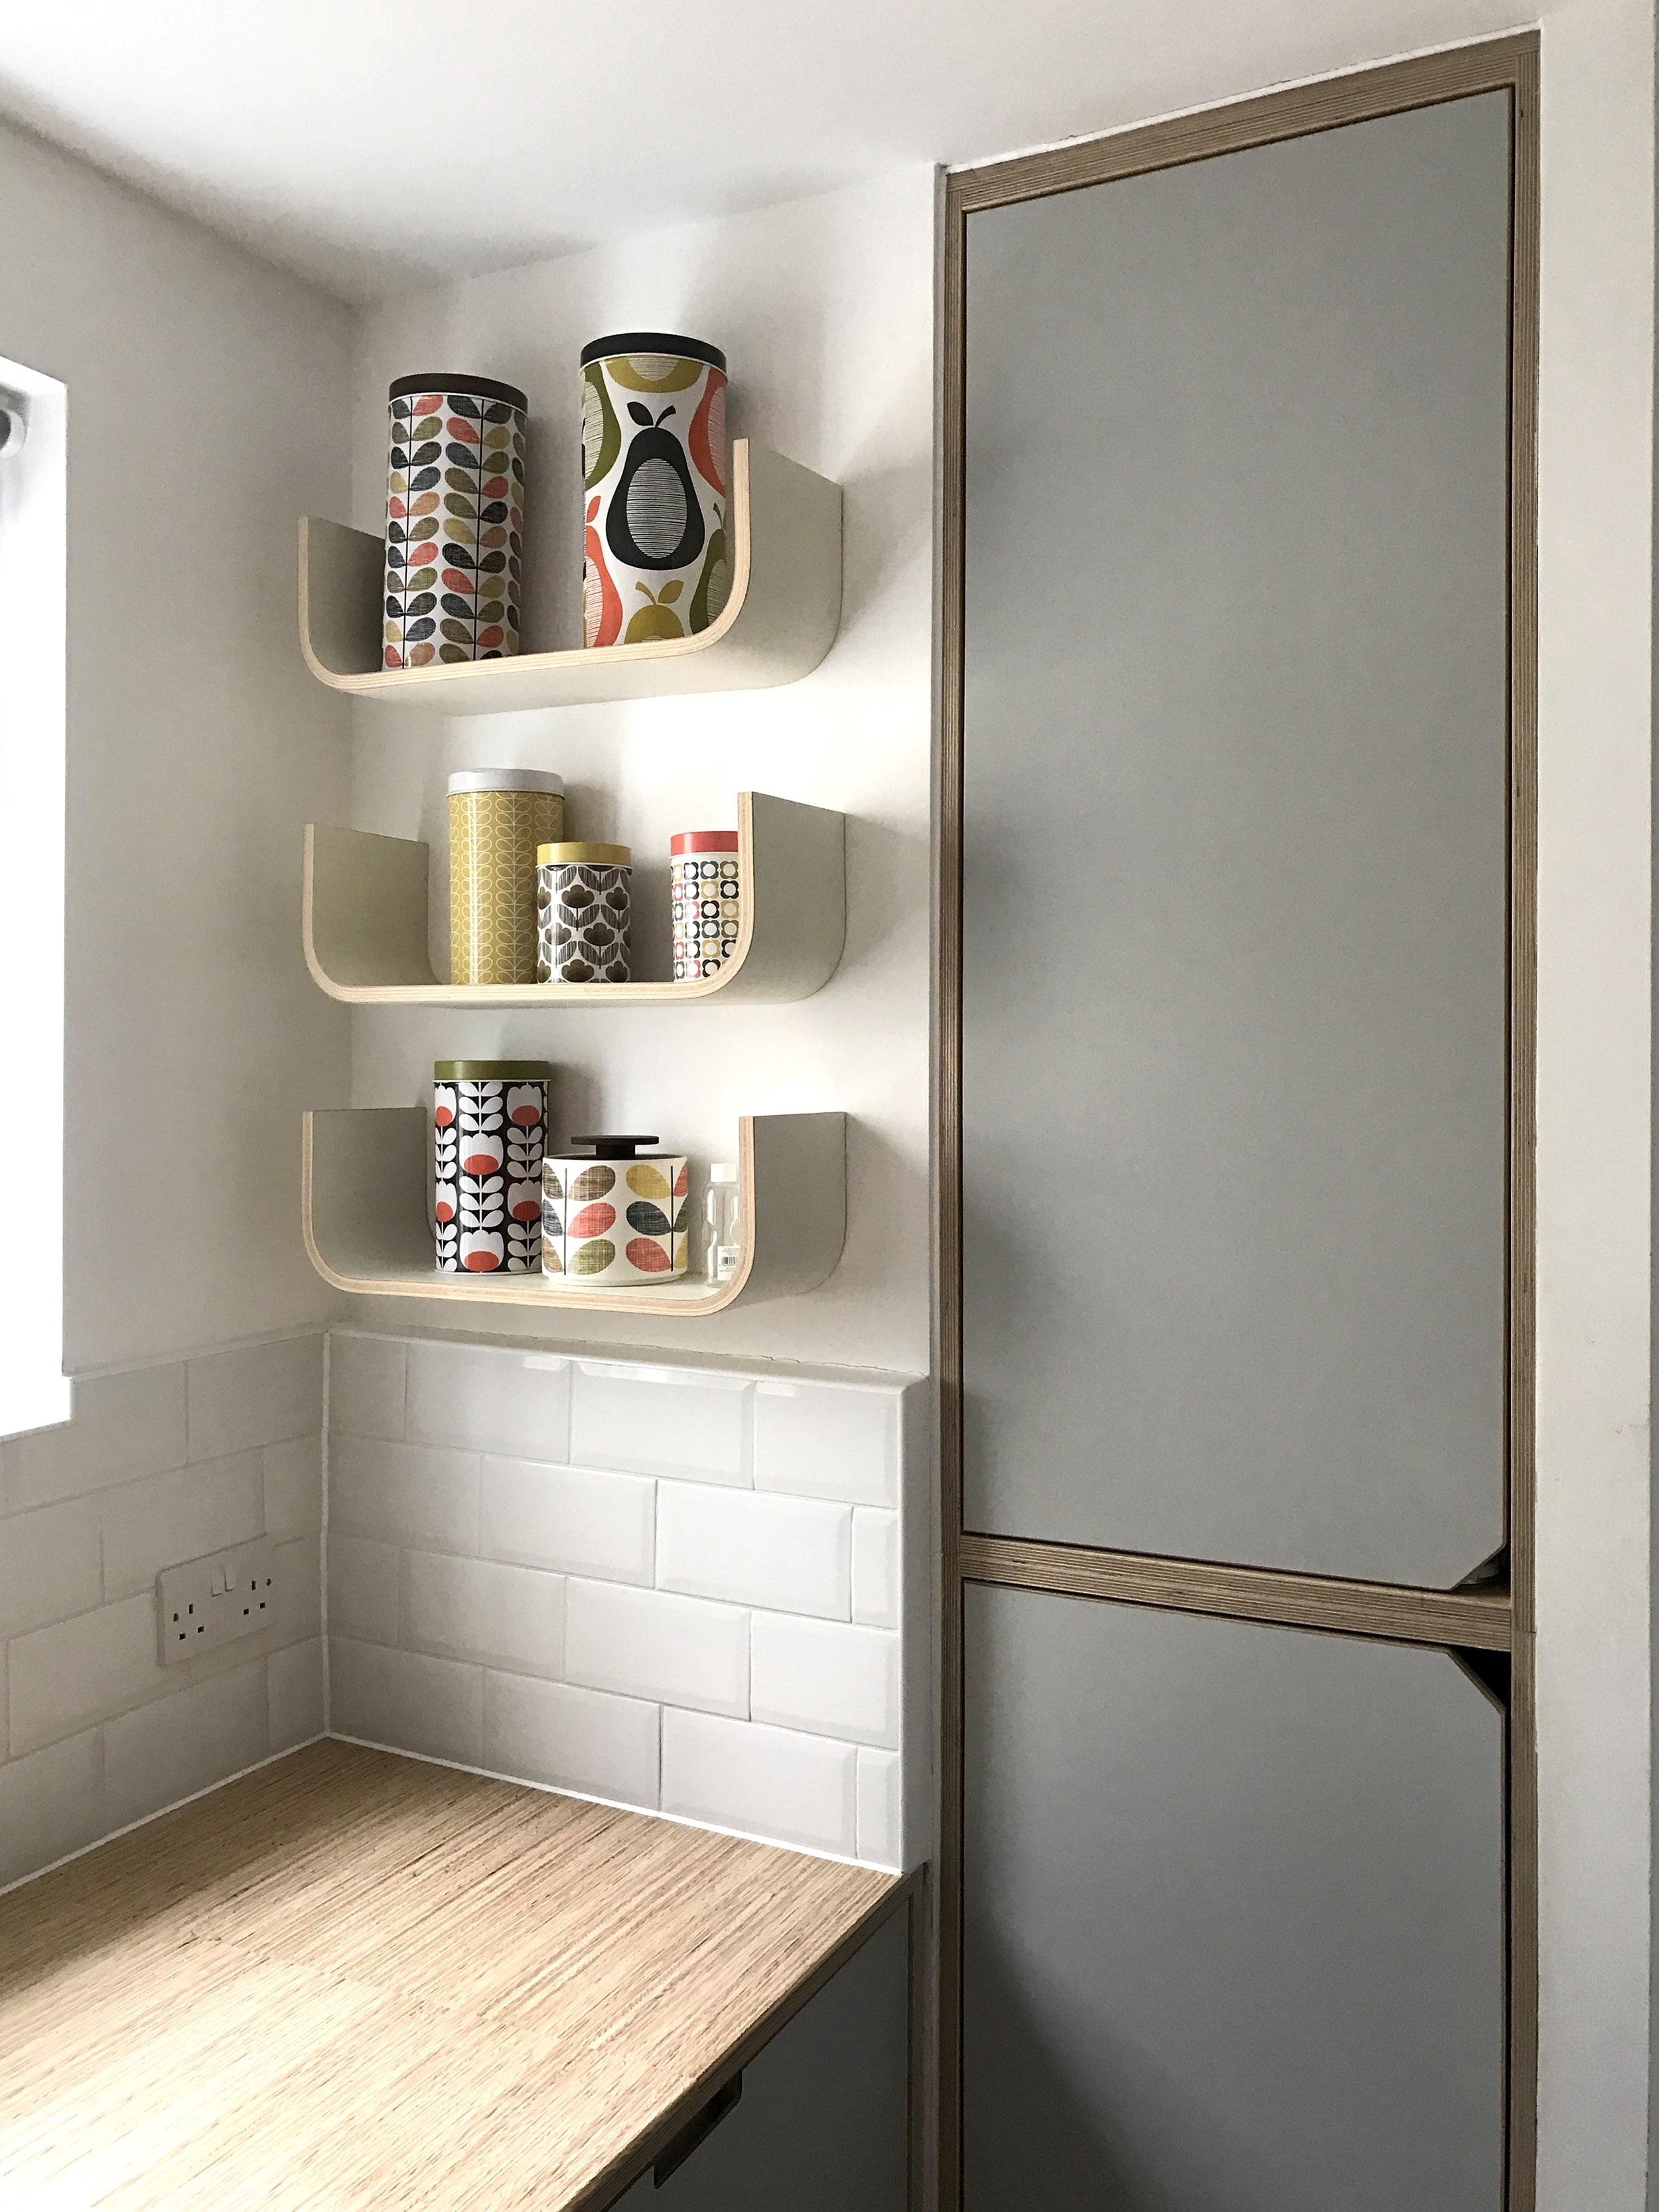 Bespoke painted U shelves create more storage space.